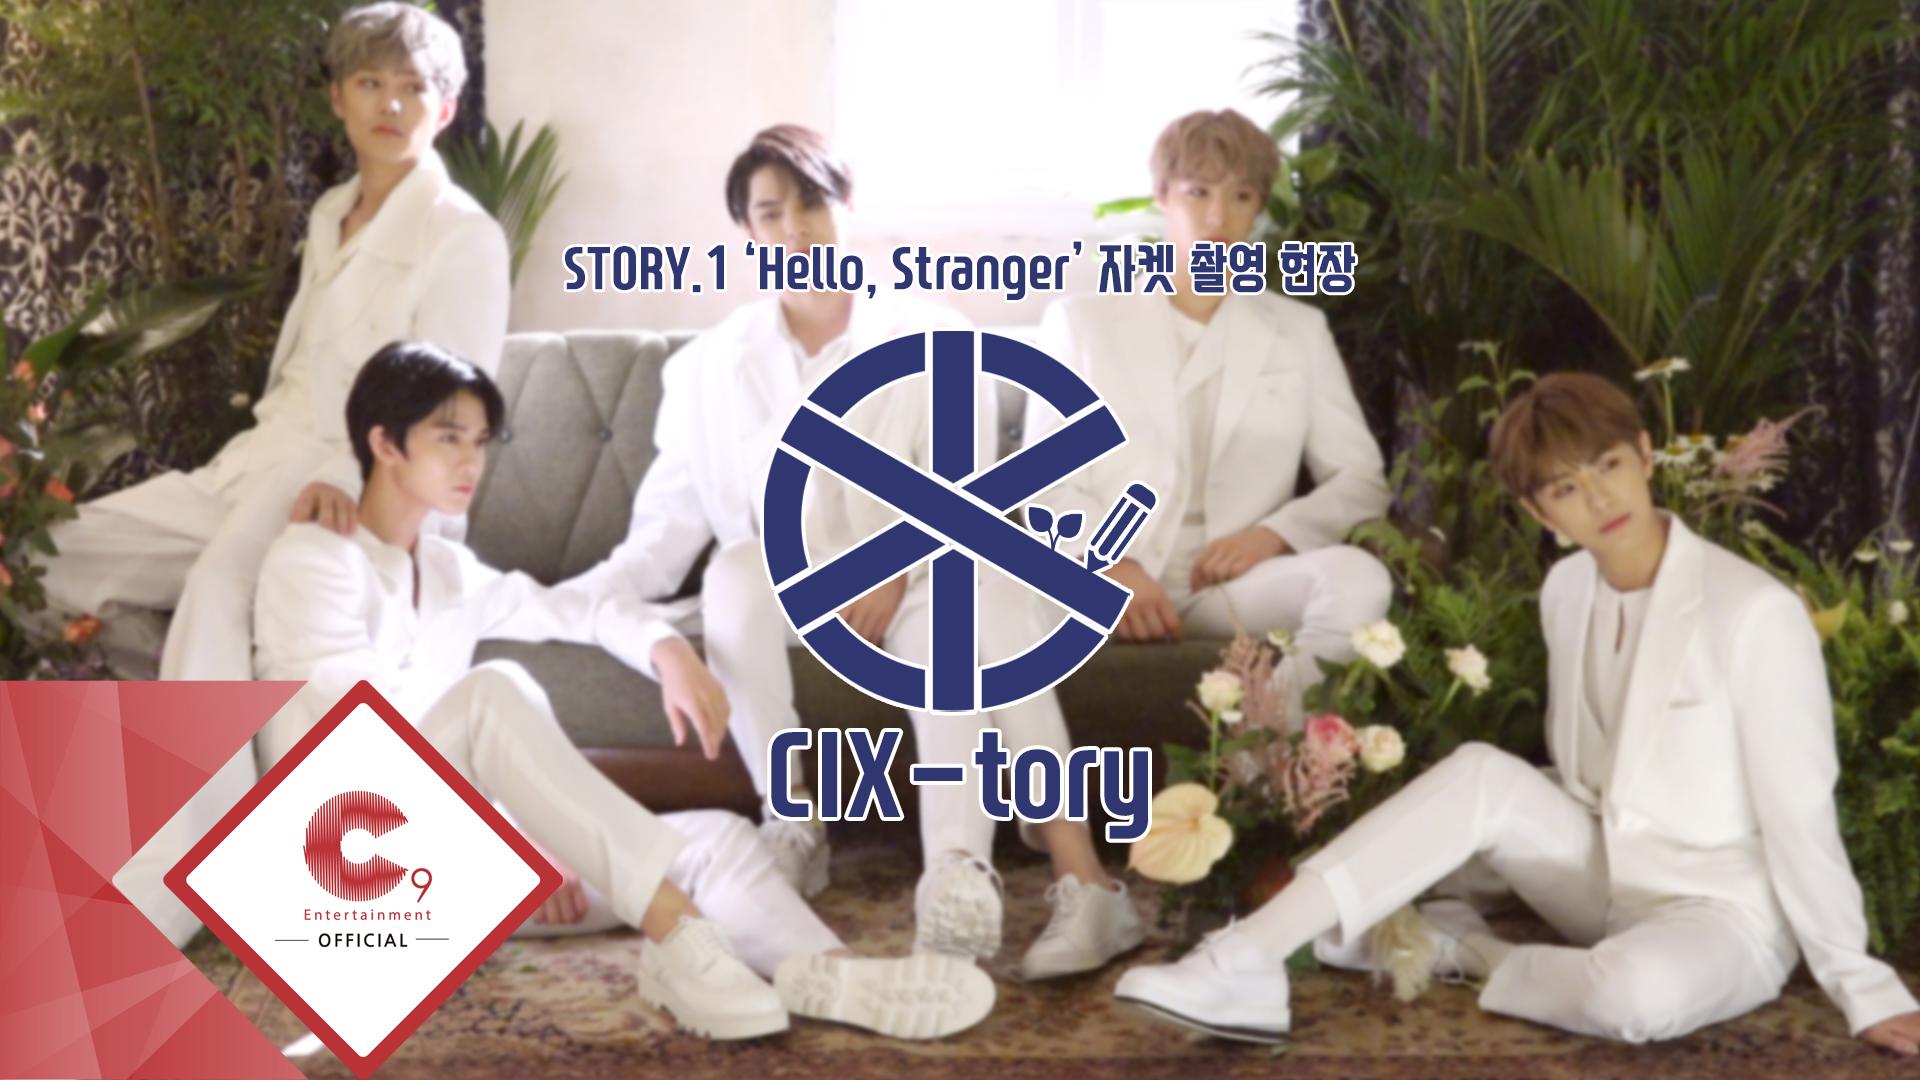 [CIX-tory] STORY.1 'Hello, Stranger' 자켓 촬영 현장